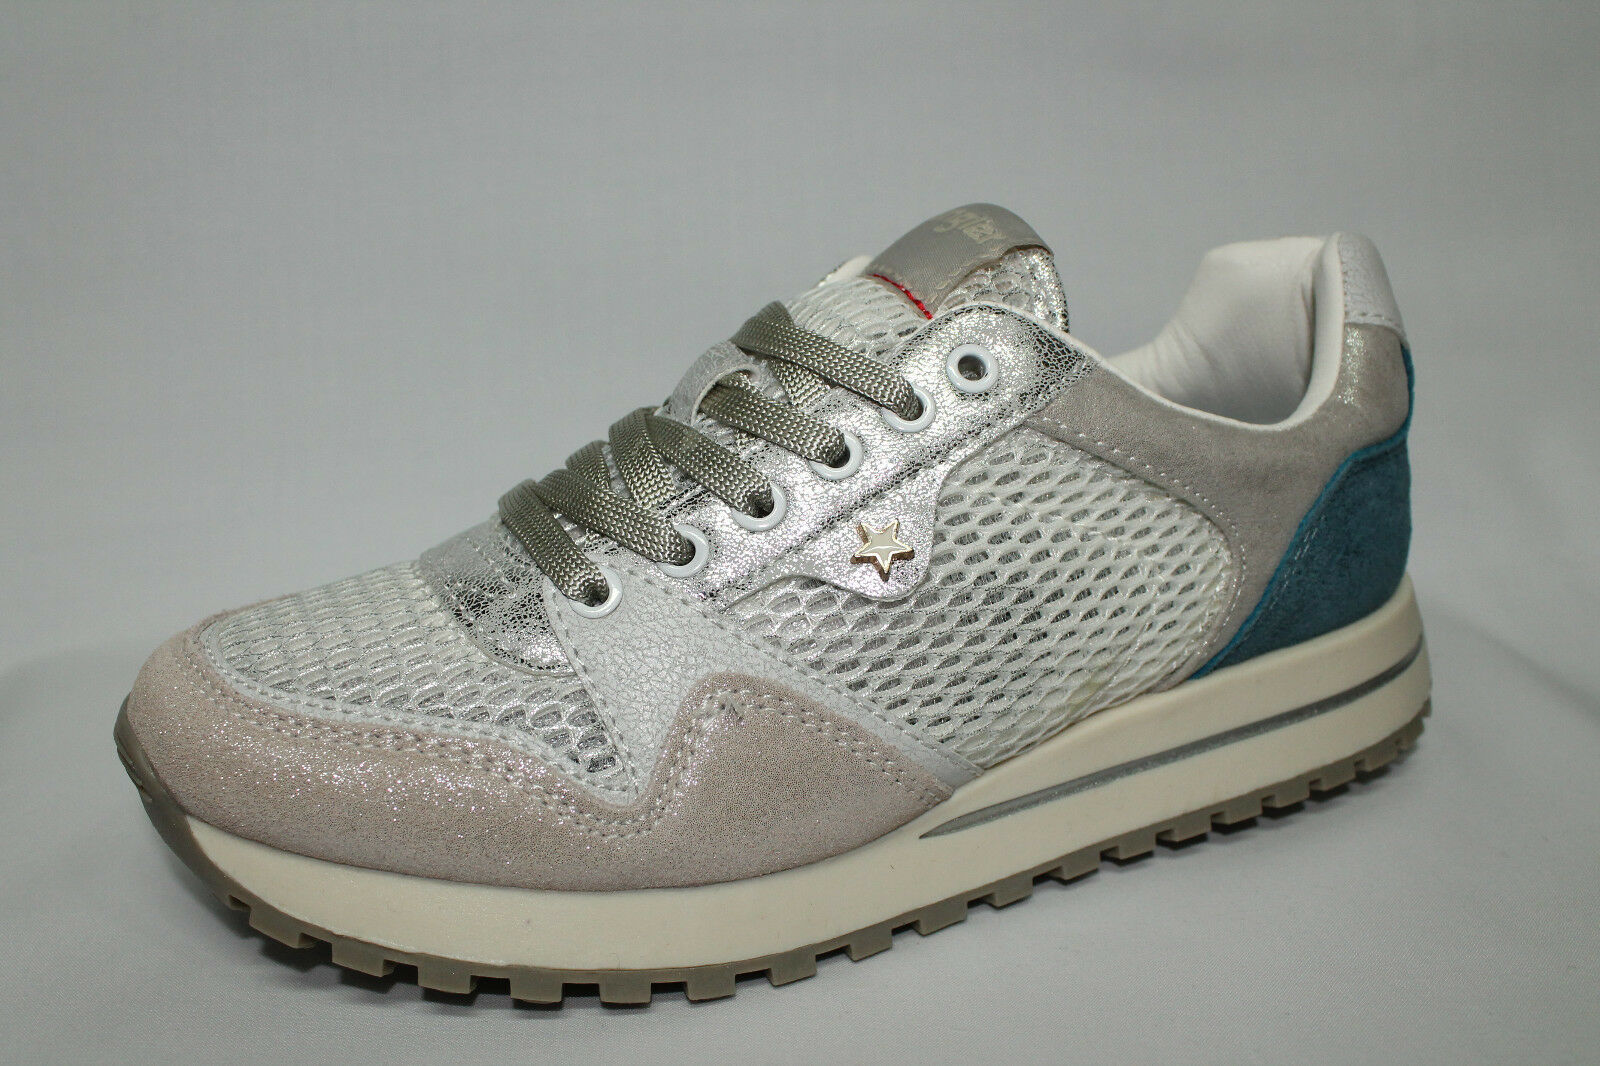 Sneakers Wrangler Beyond bianco, argento e azzurro Memory Foam list - 20%